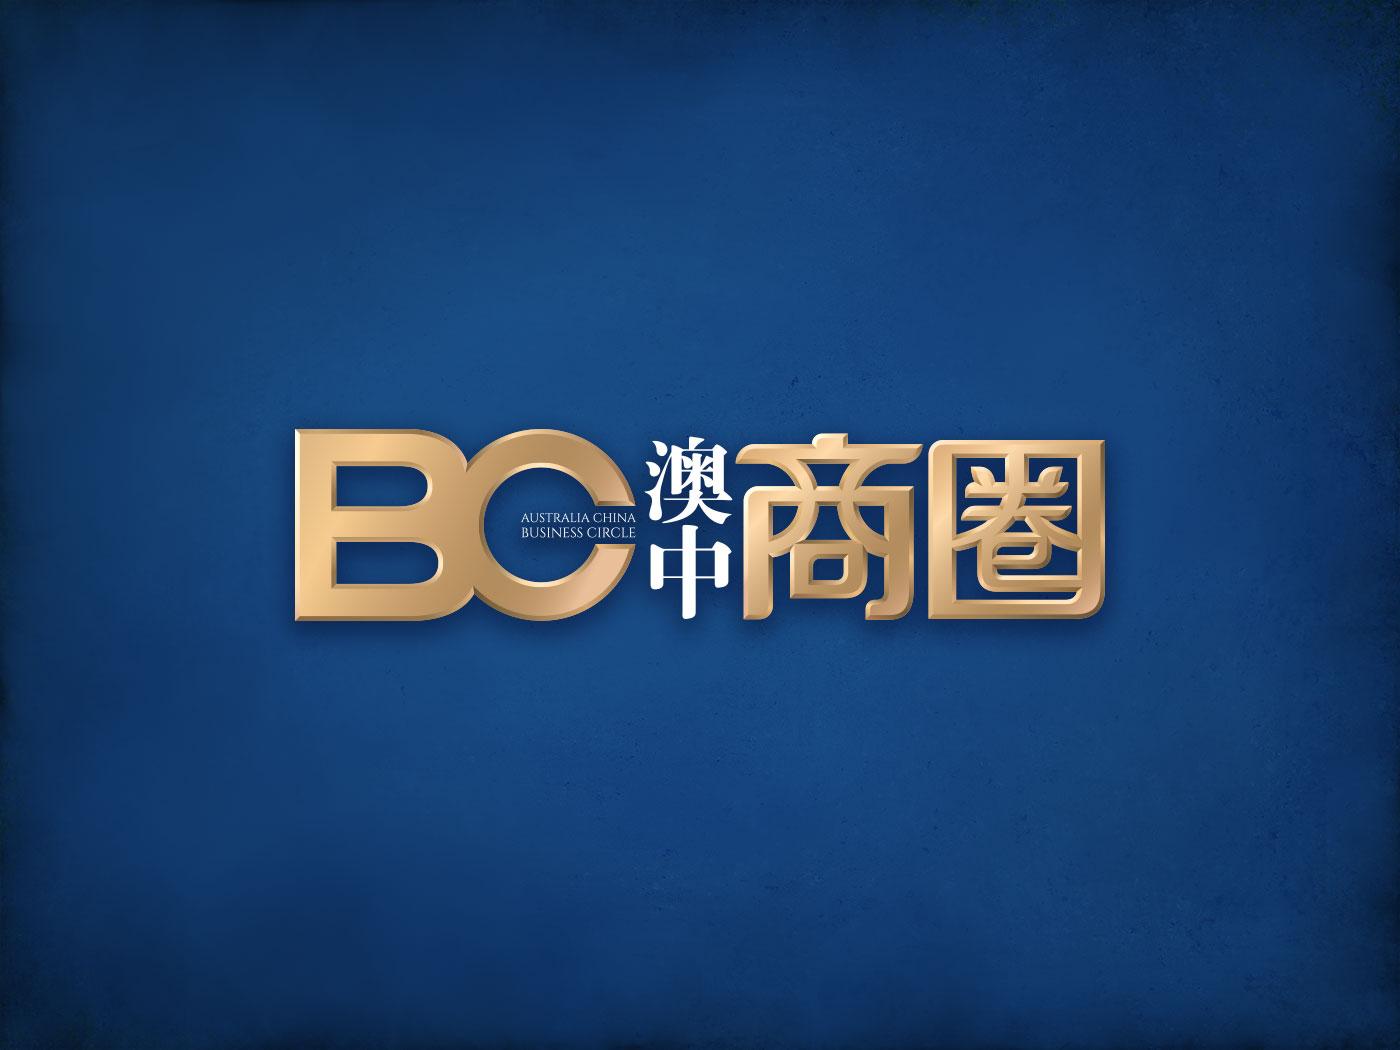 bc branding & magazine design by Z Creative Studio Branding & Graphic Design Melbourne